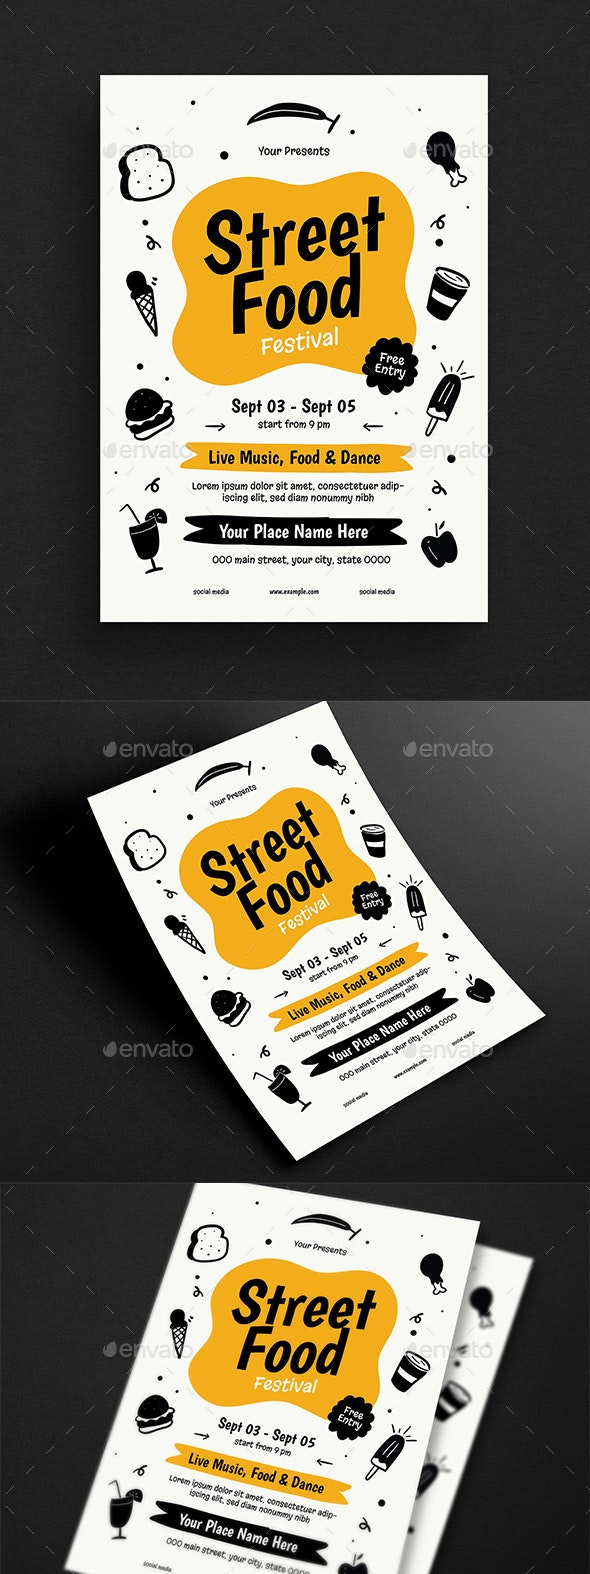 Street Food Event Flyer - Flyers Print Templates